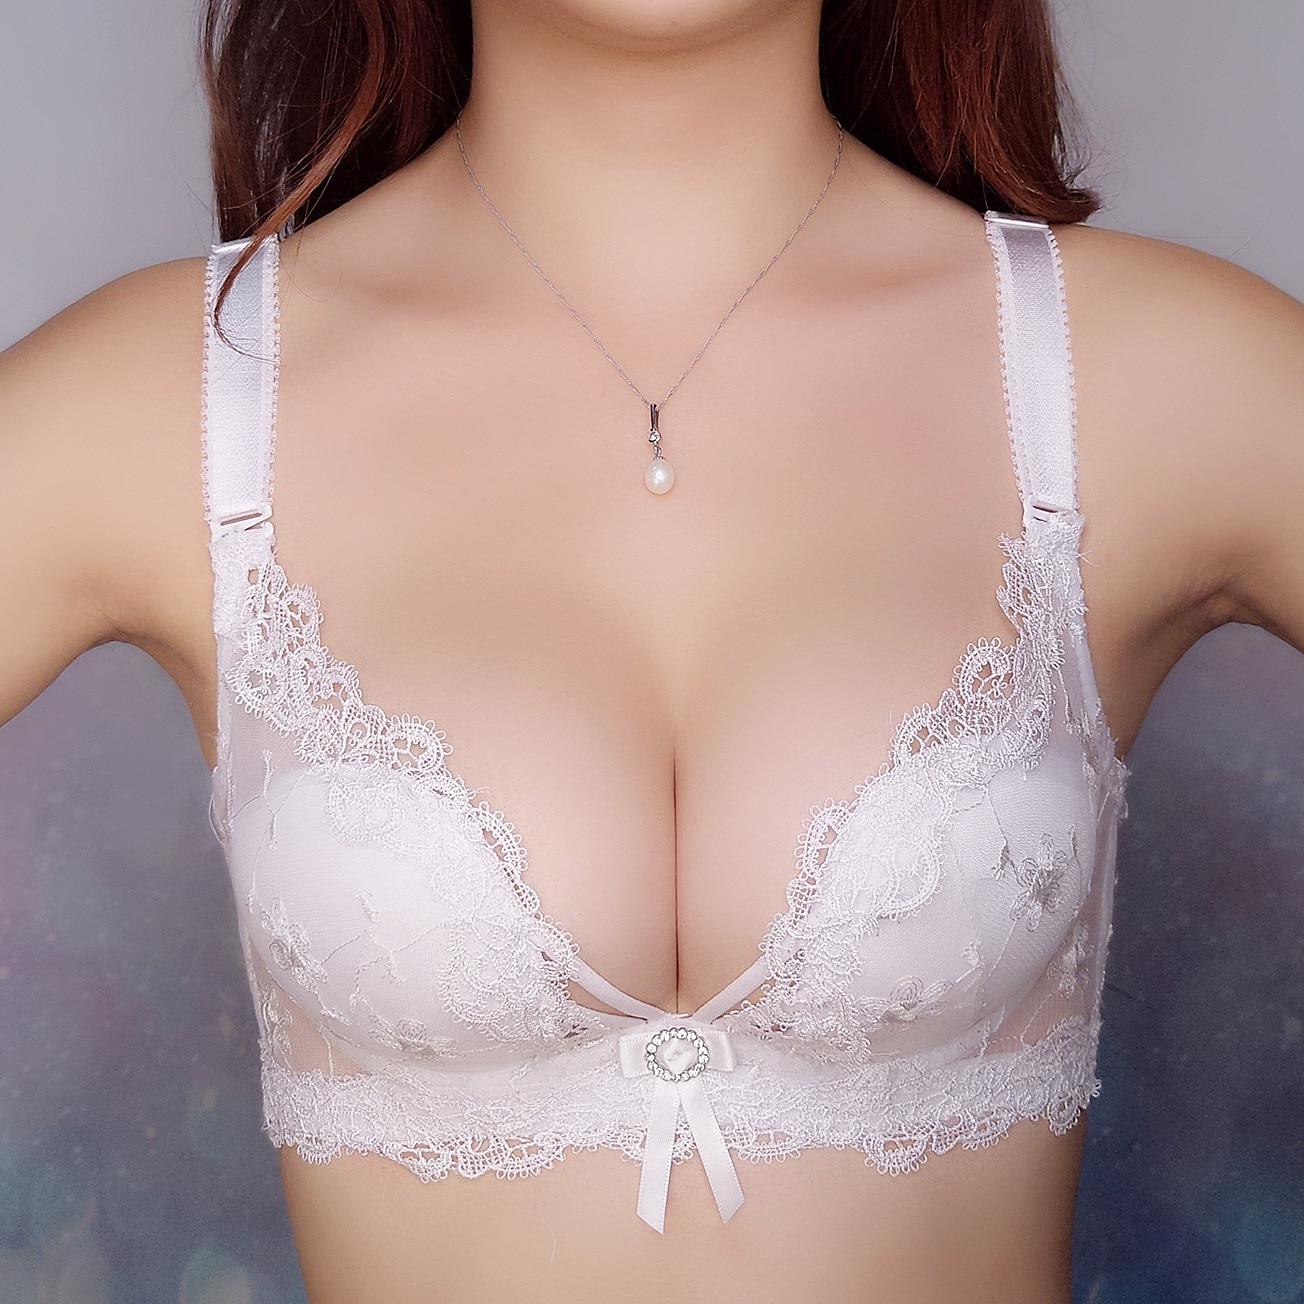 2017 New Lace Silk Empty Underwear Three Rows Push Up Sexy -6559